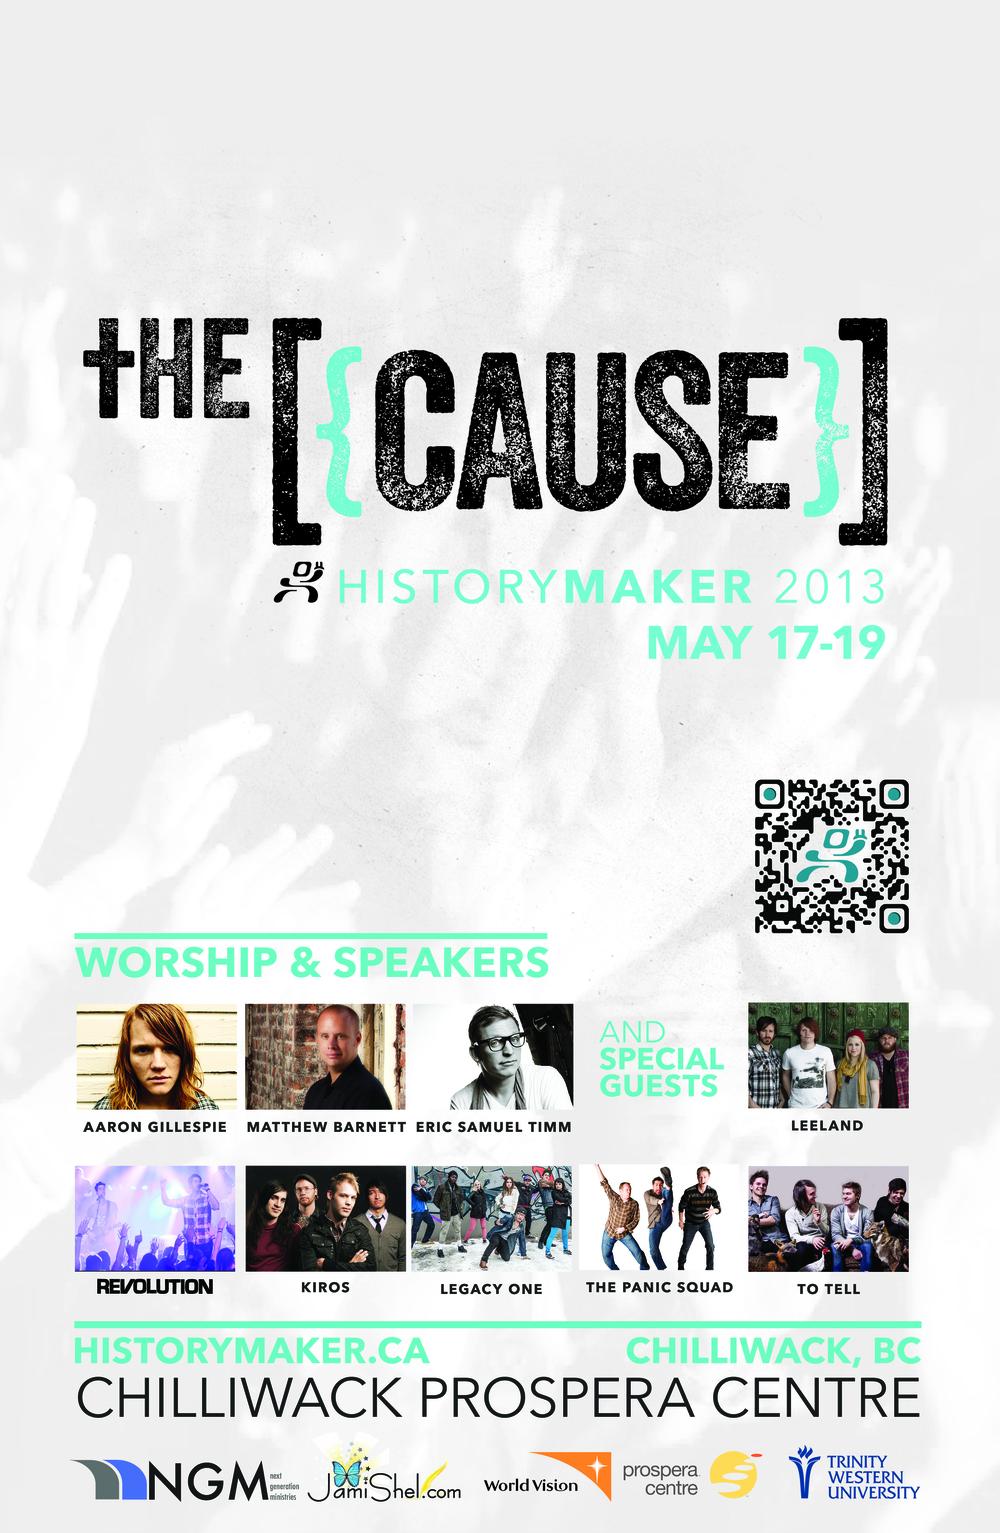 Historymaker_Poster_2013.jpg